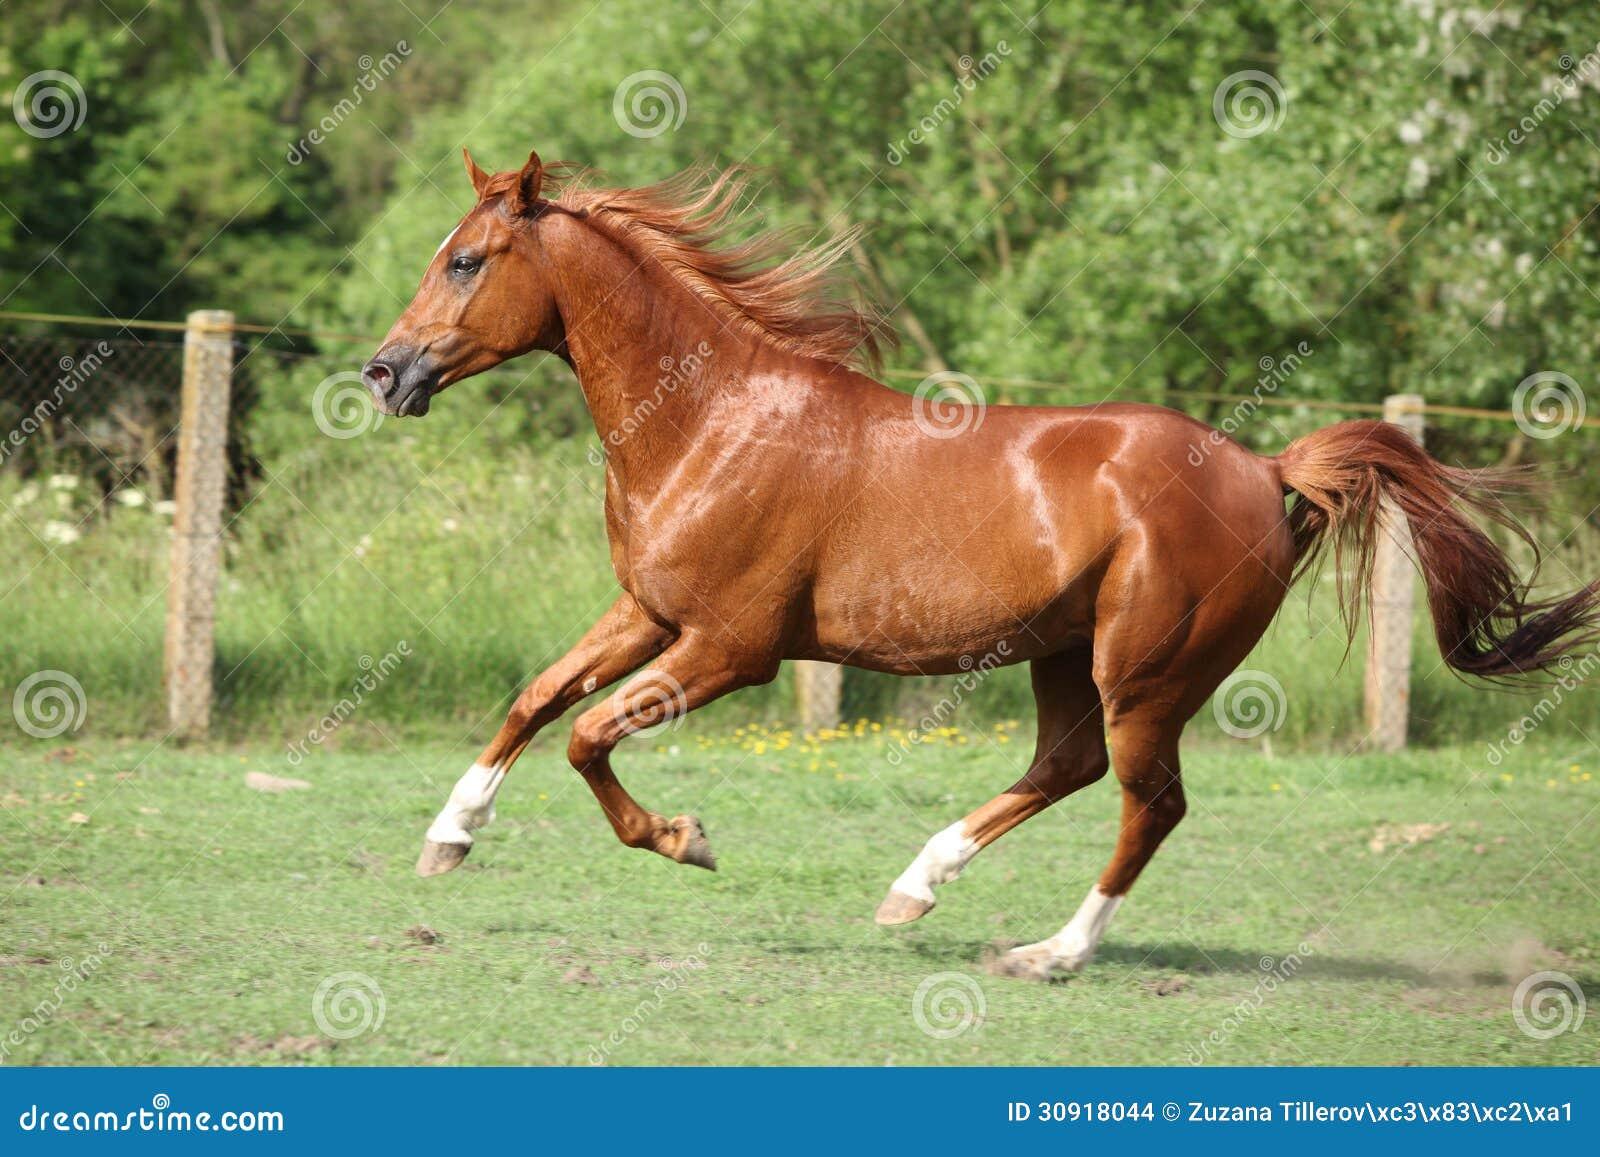 Chestnut arabian horses - photo#22